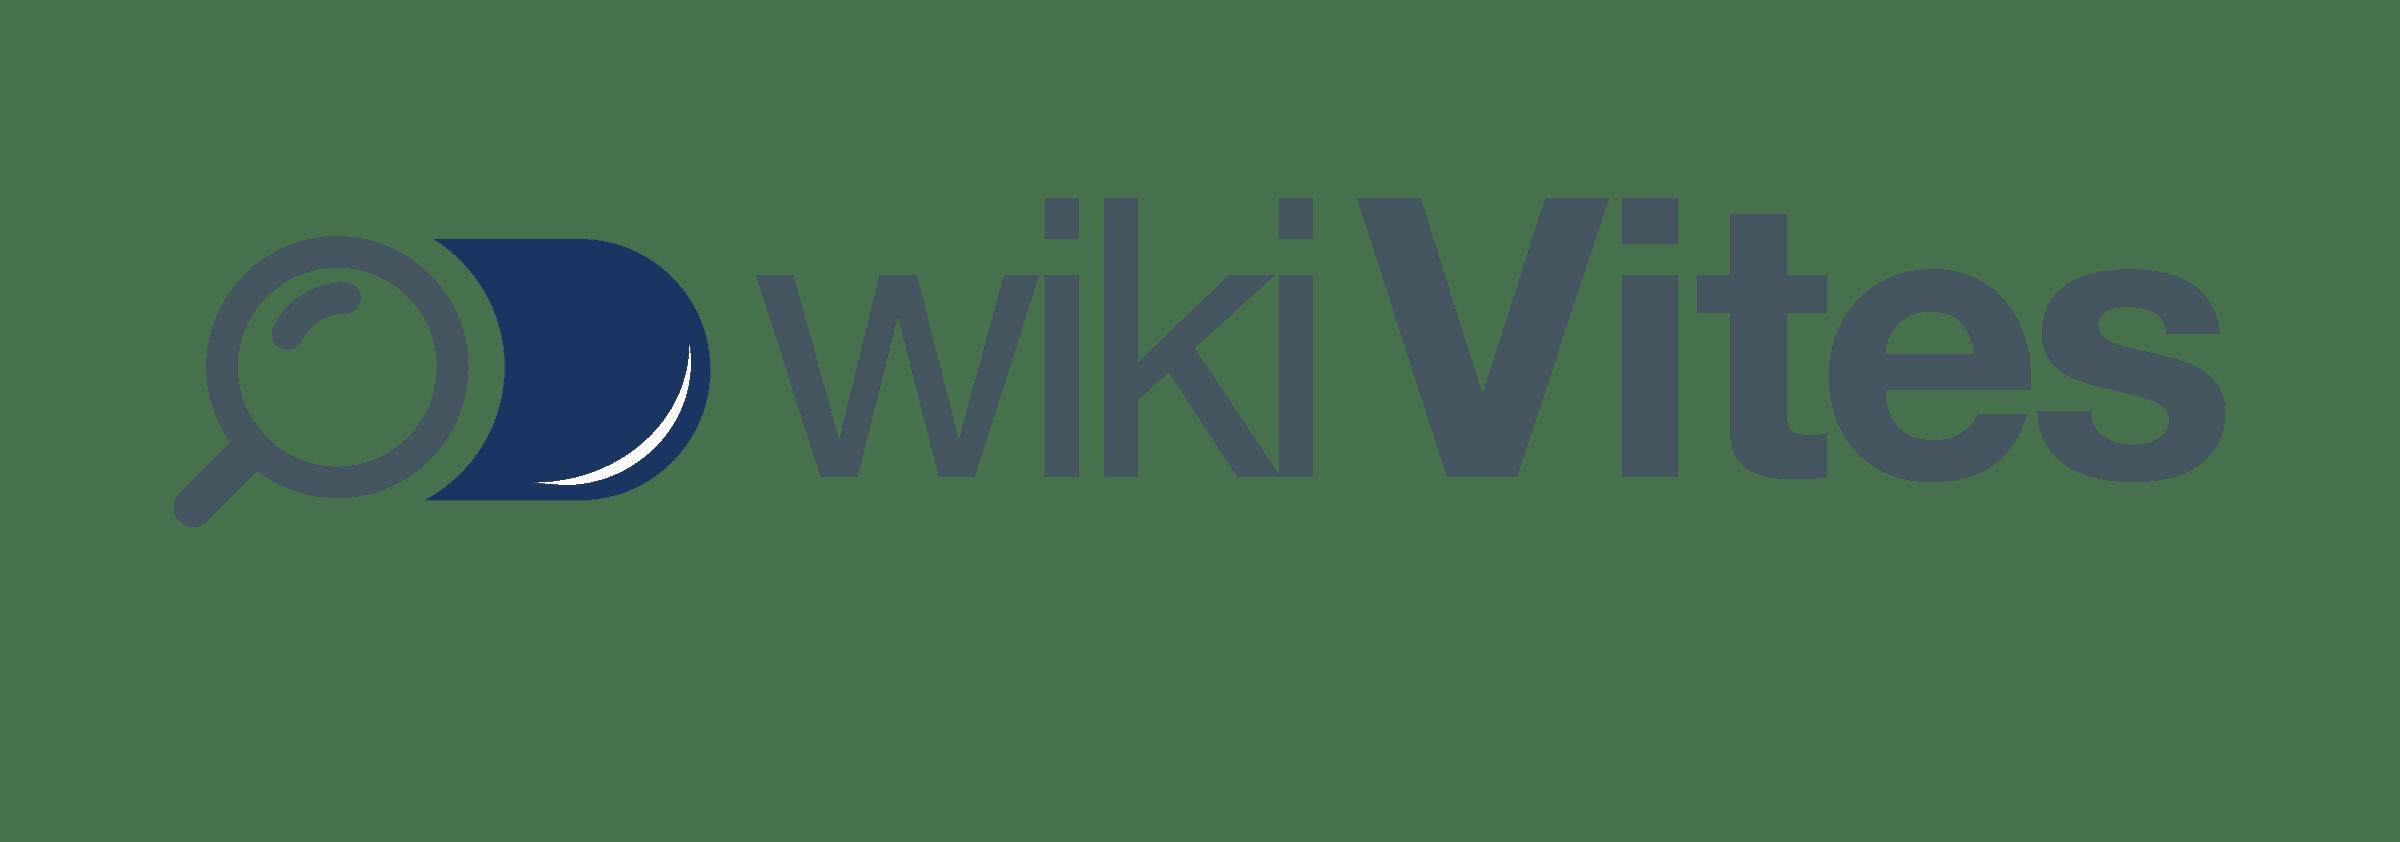 WikiVites.com